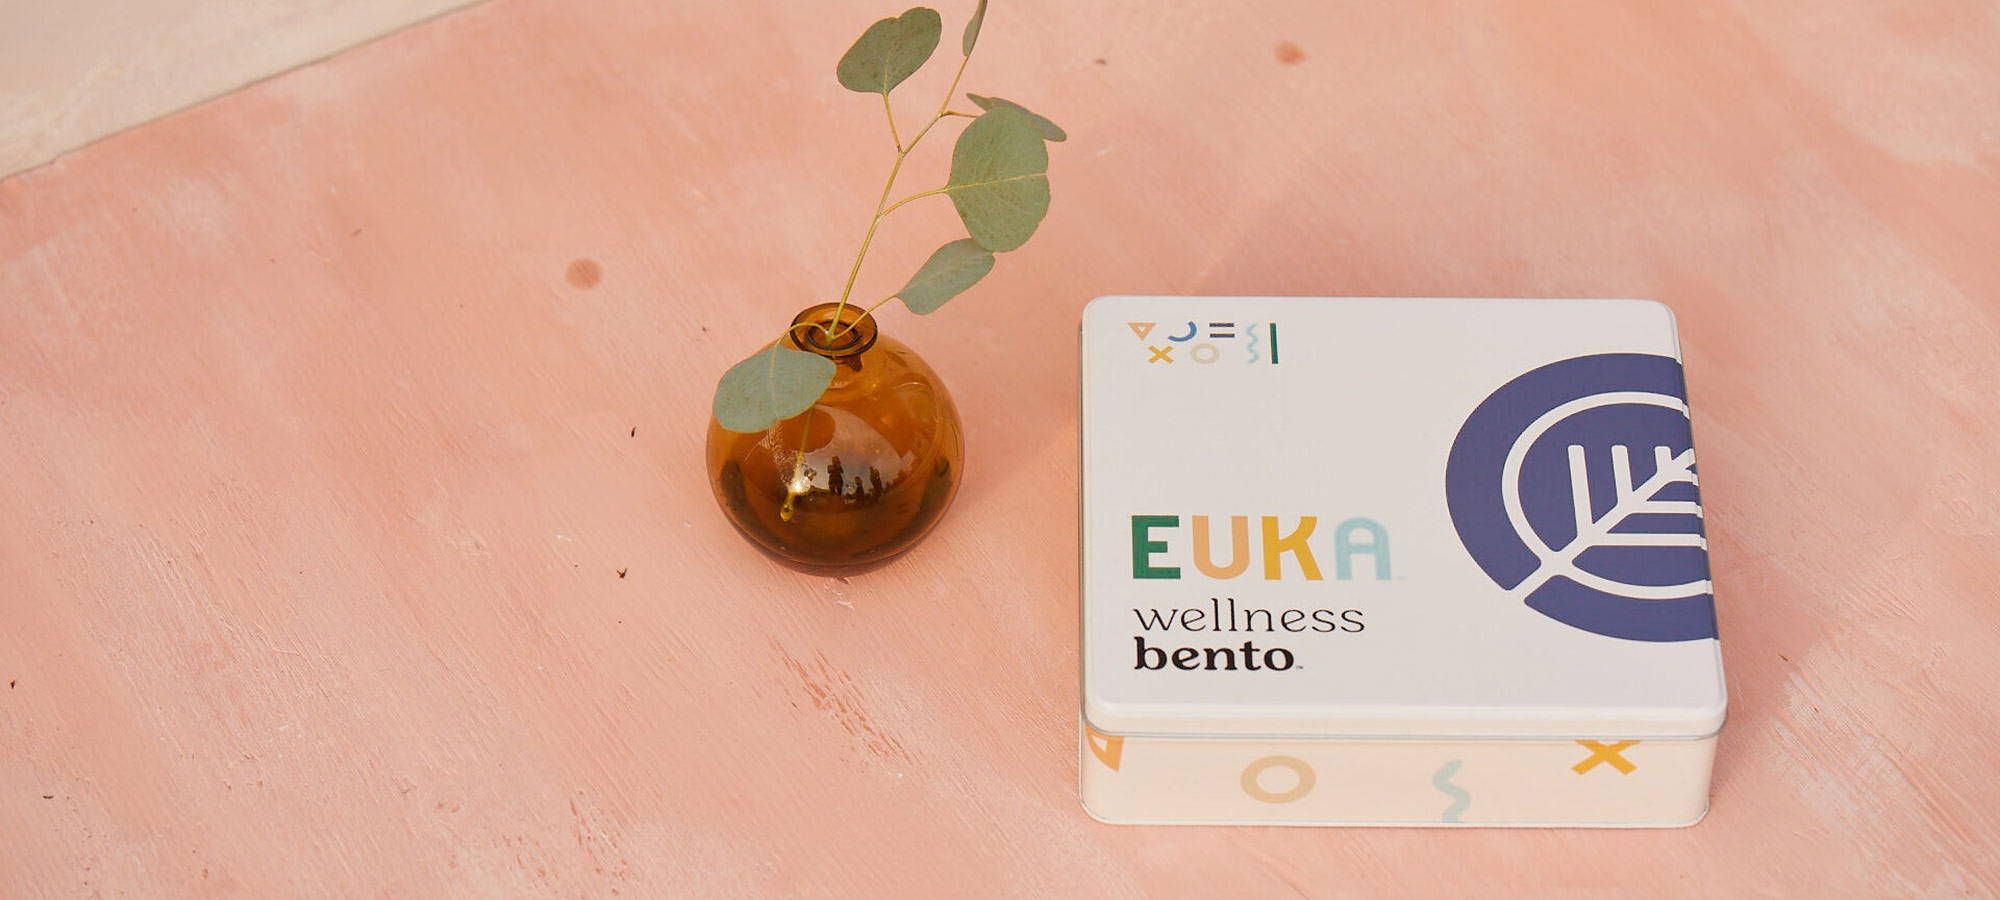 Euka Wellness Bento